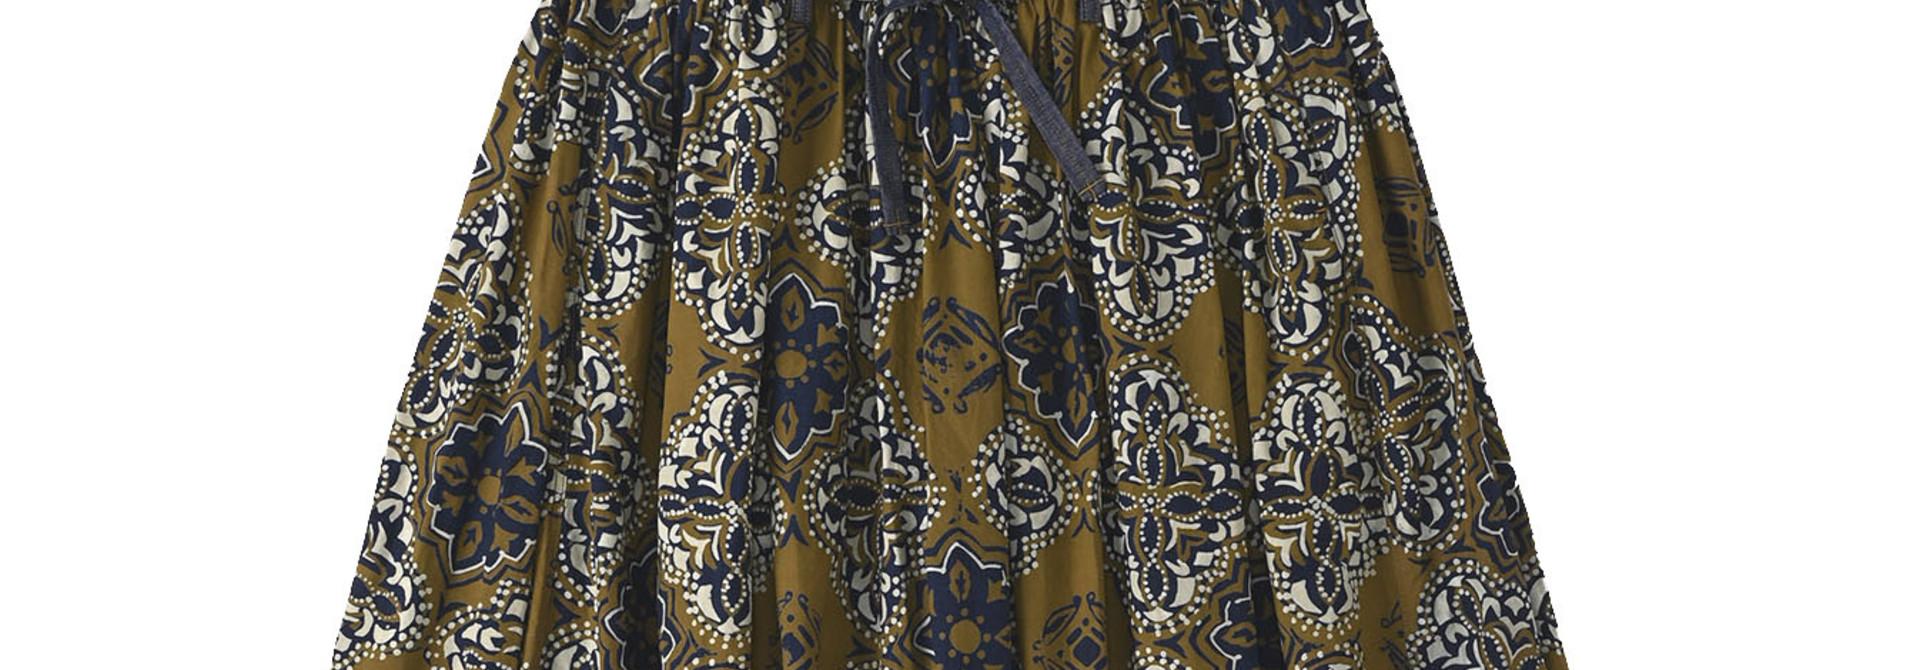 Batik Printed Gathered Dress(0721)